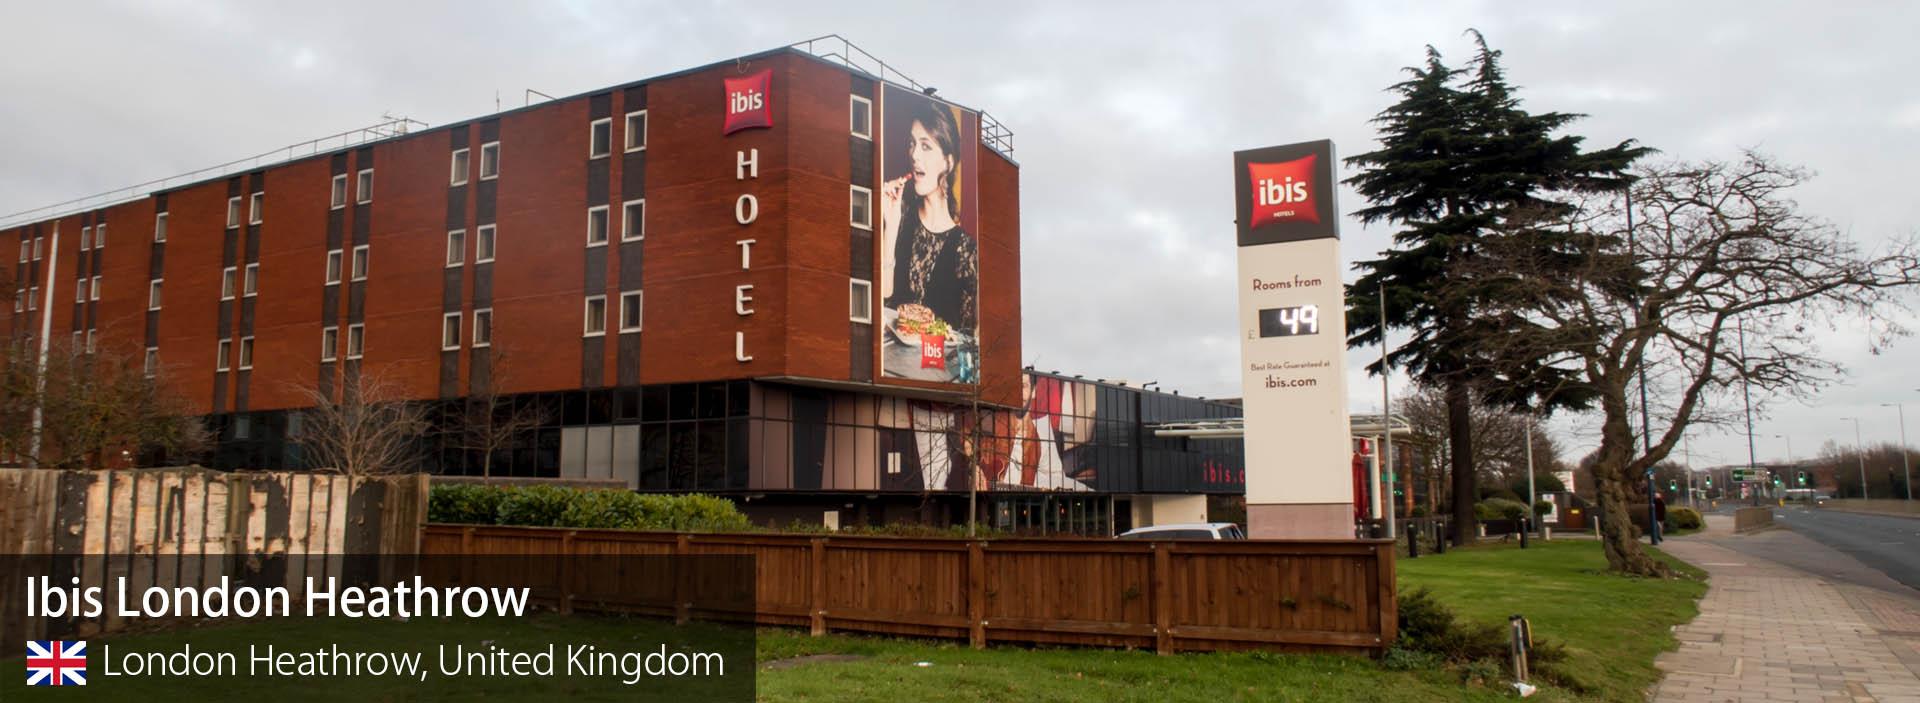 Airport Hotel Review: Ibis London Heathrow